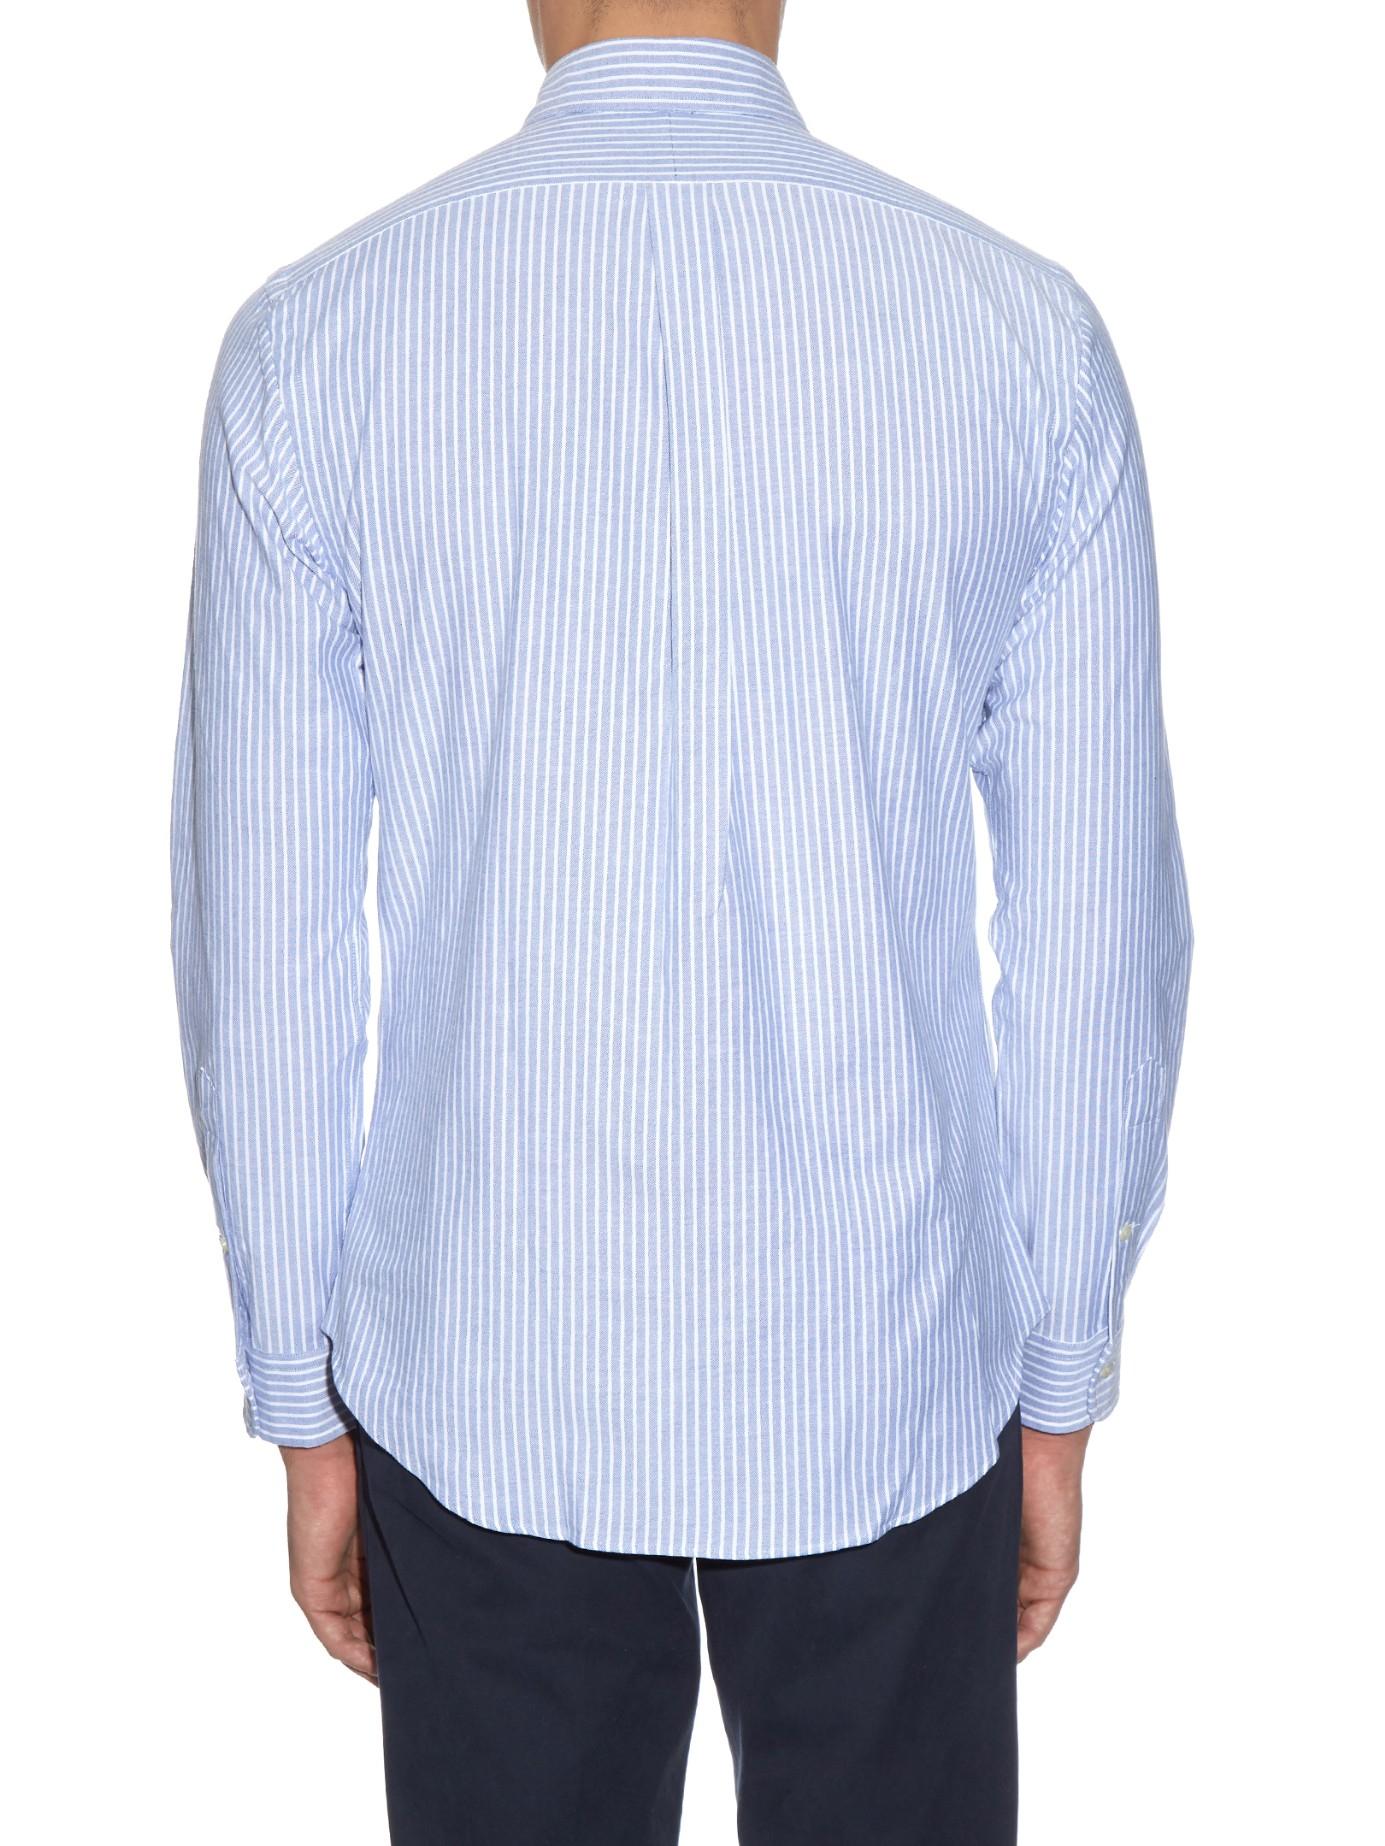 polo ralph lauren striped cotton oxford blend shirt in